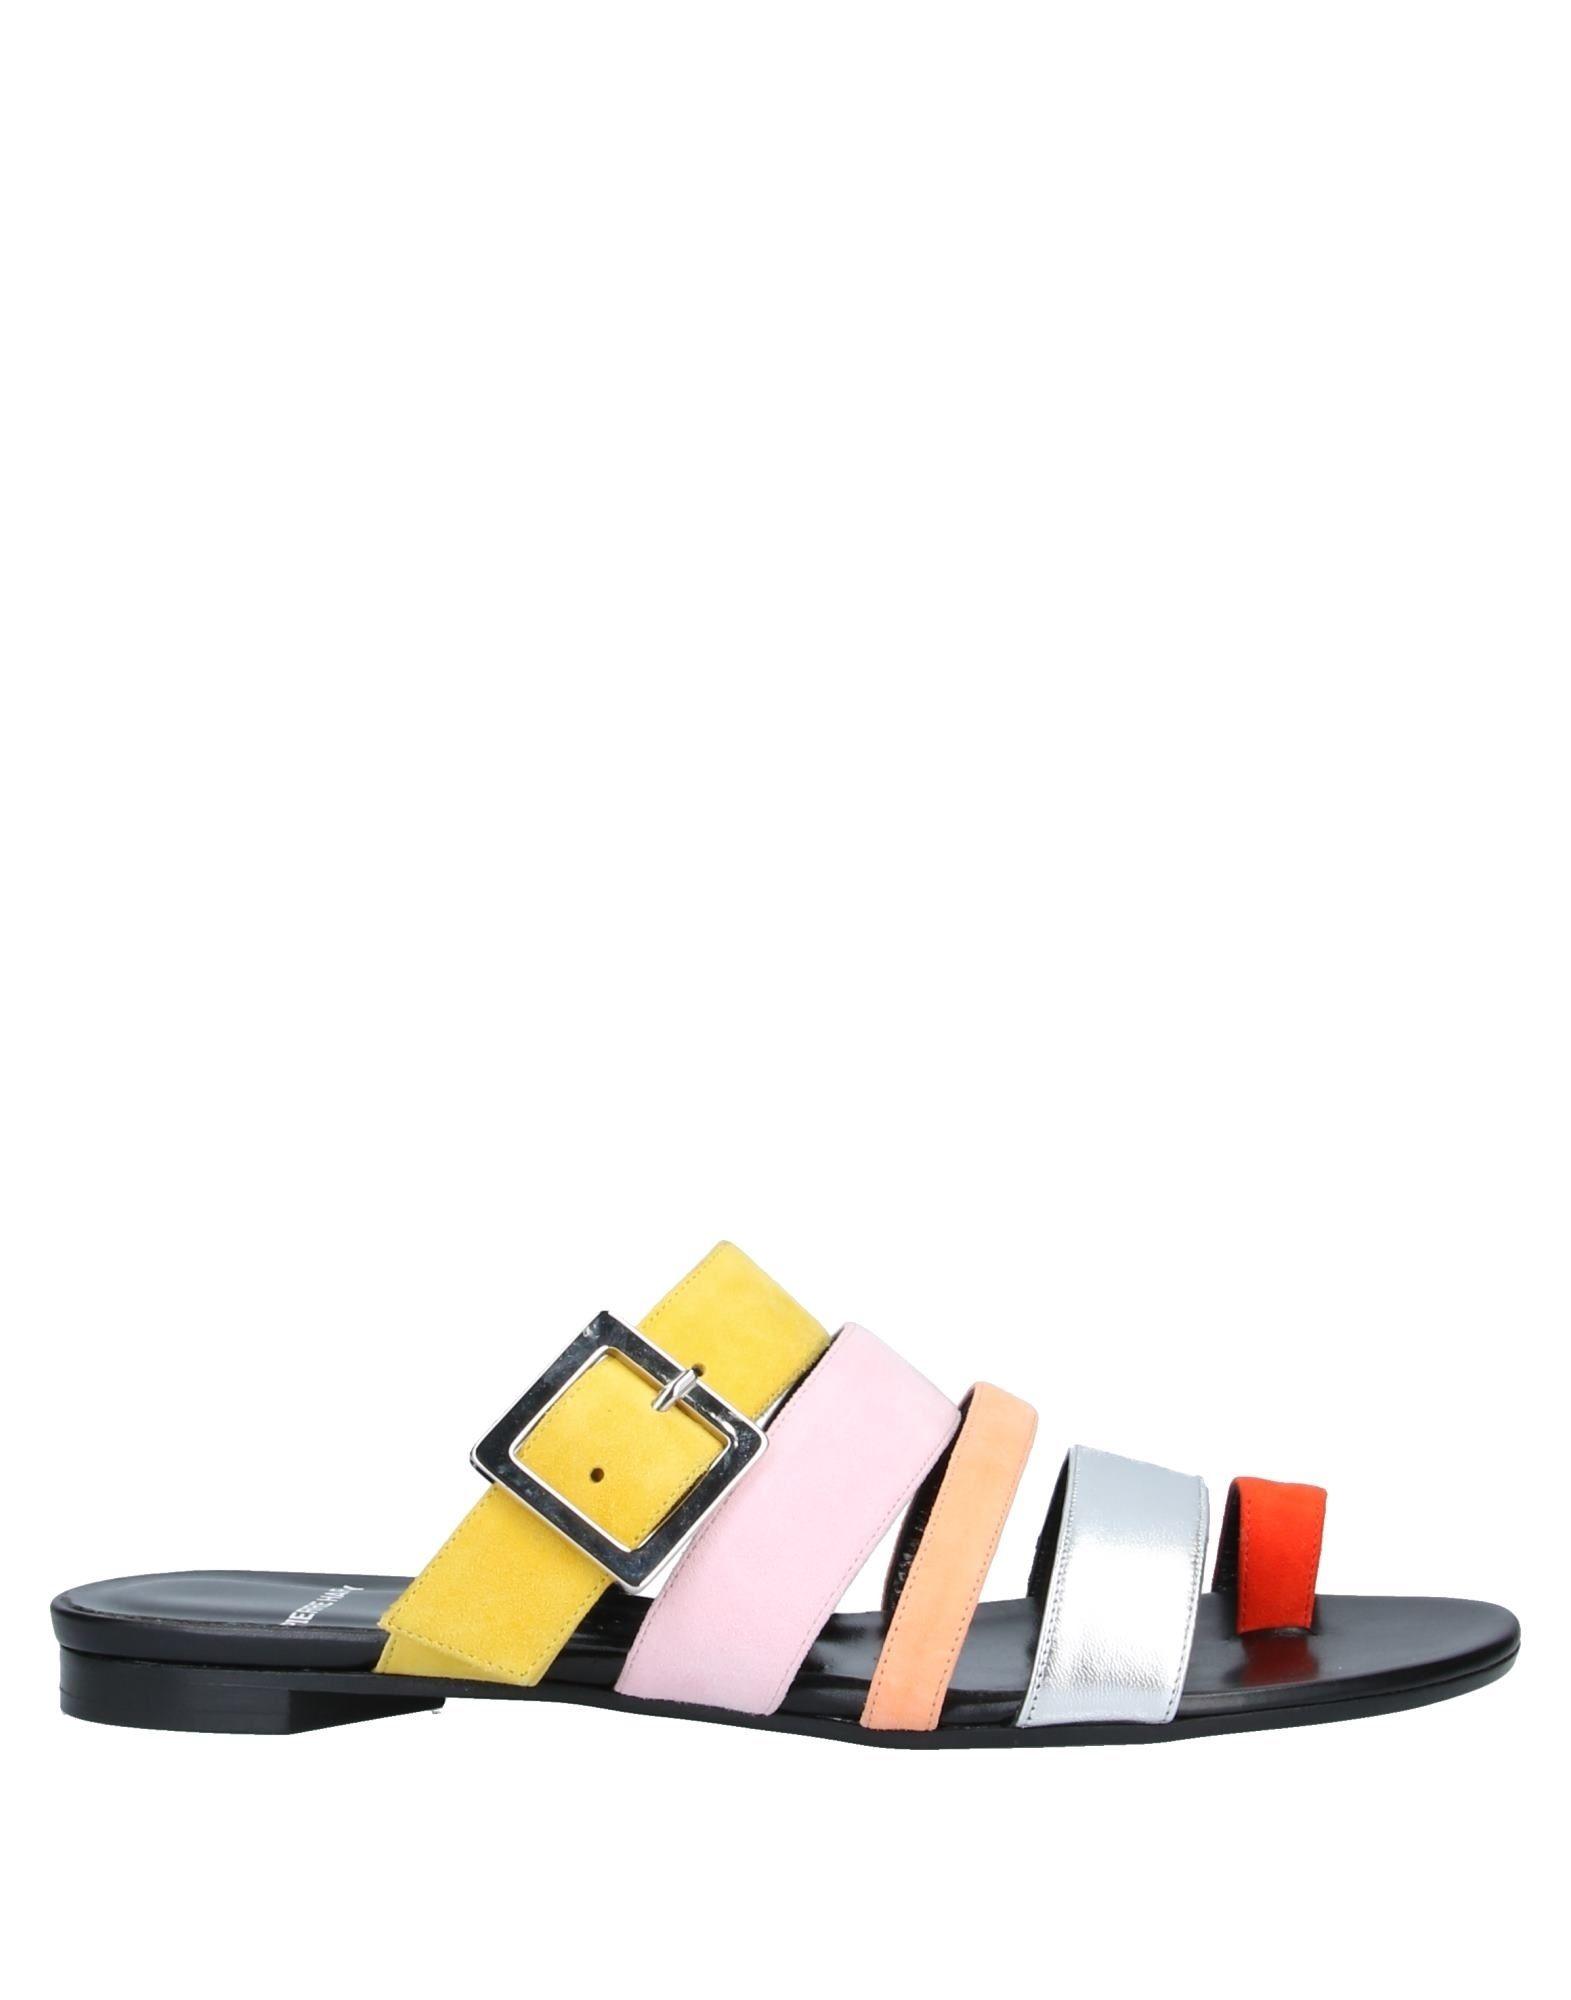 PIERRE HARDY Вьетнамки pierre hardy обувь на шнурках